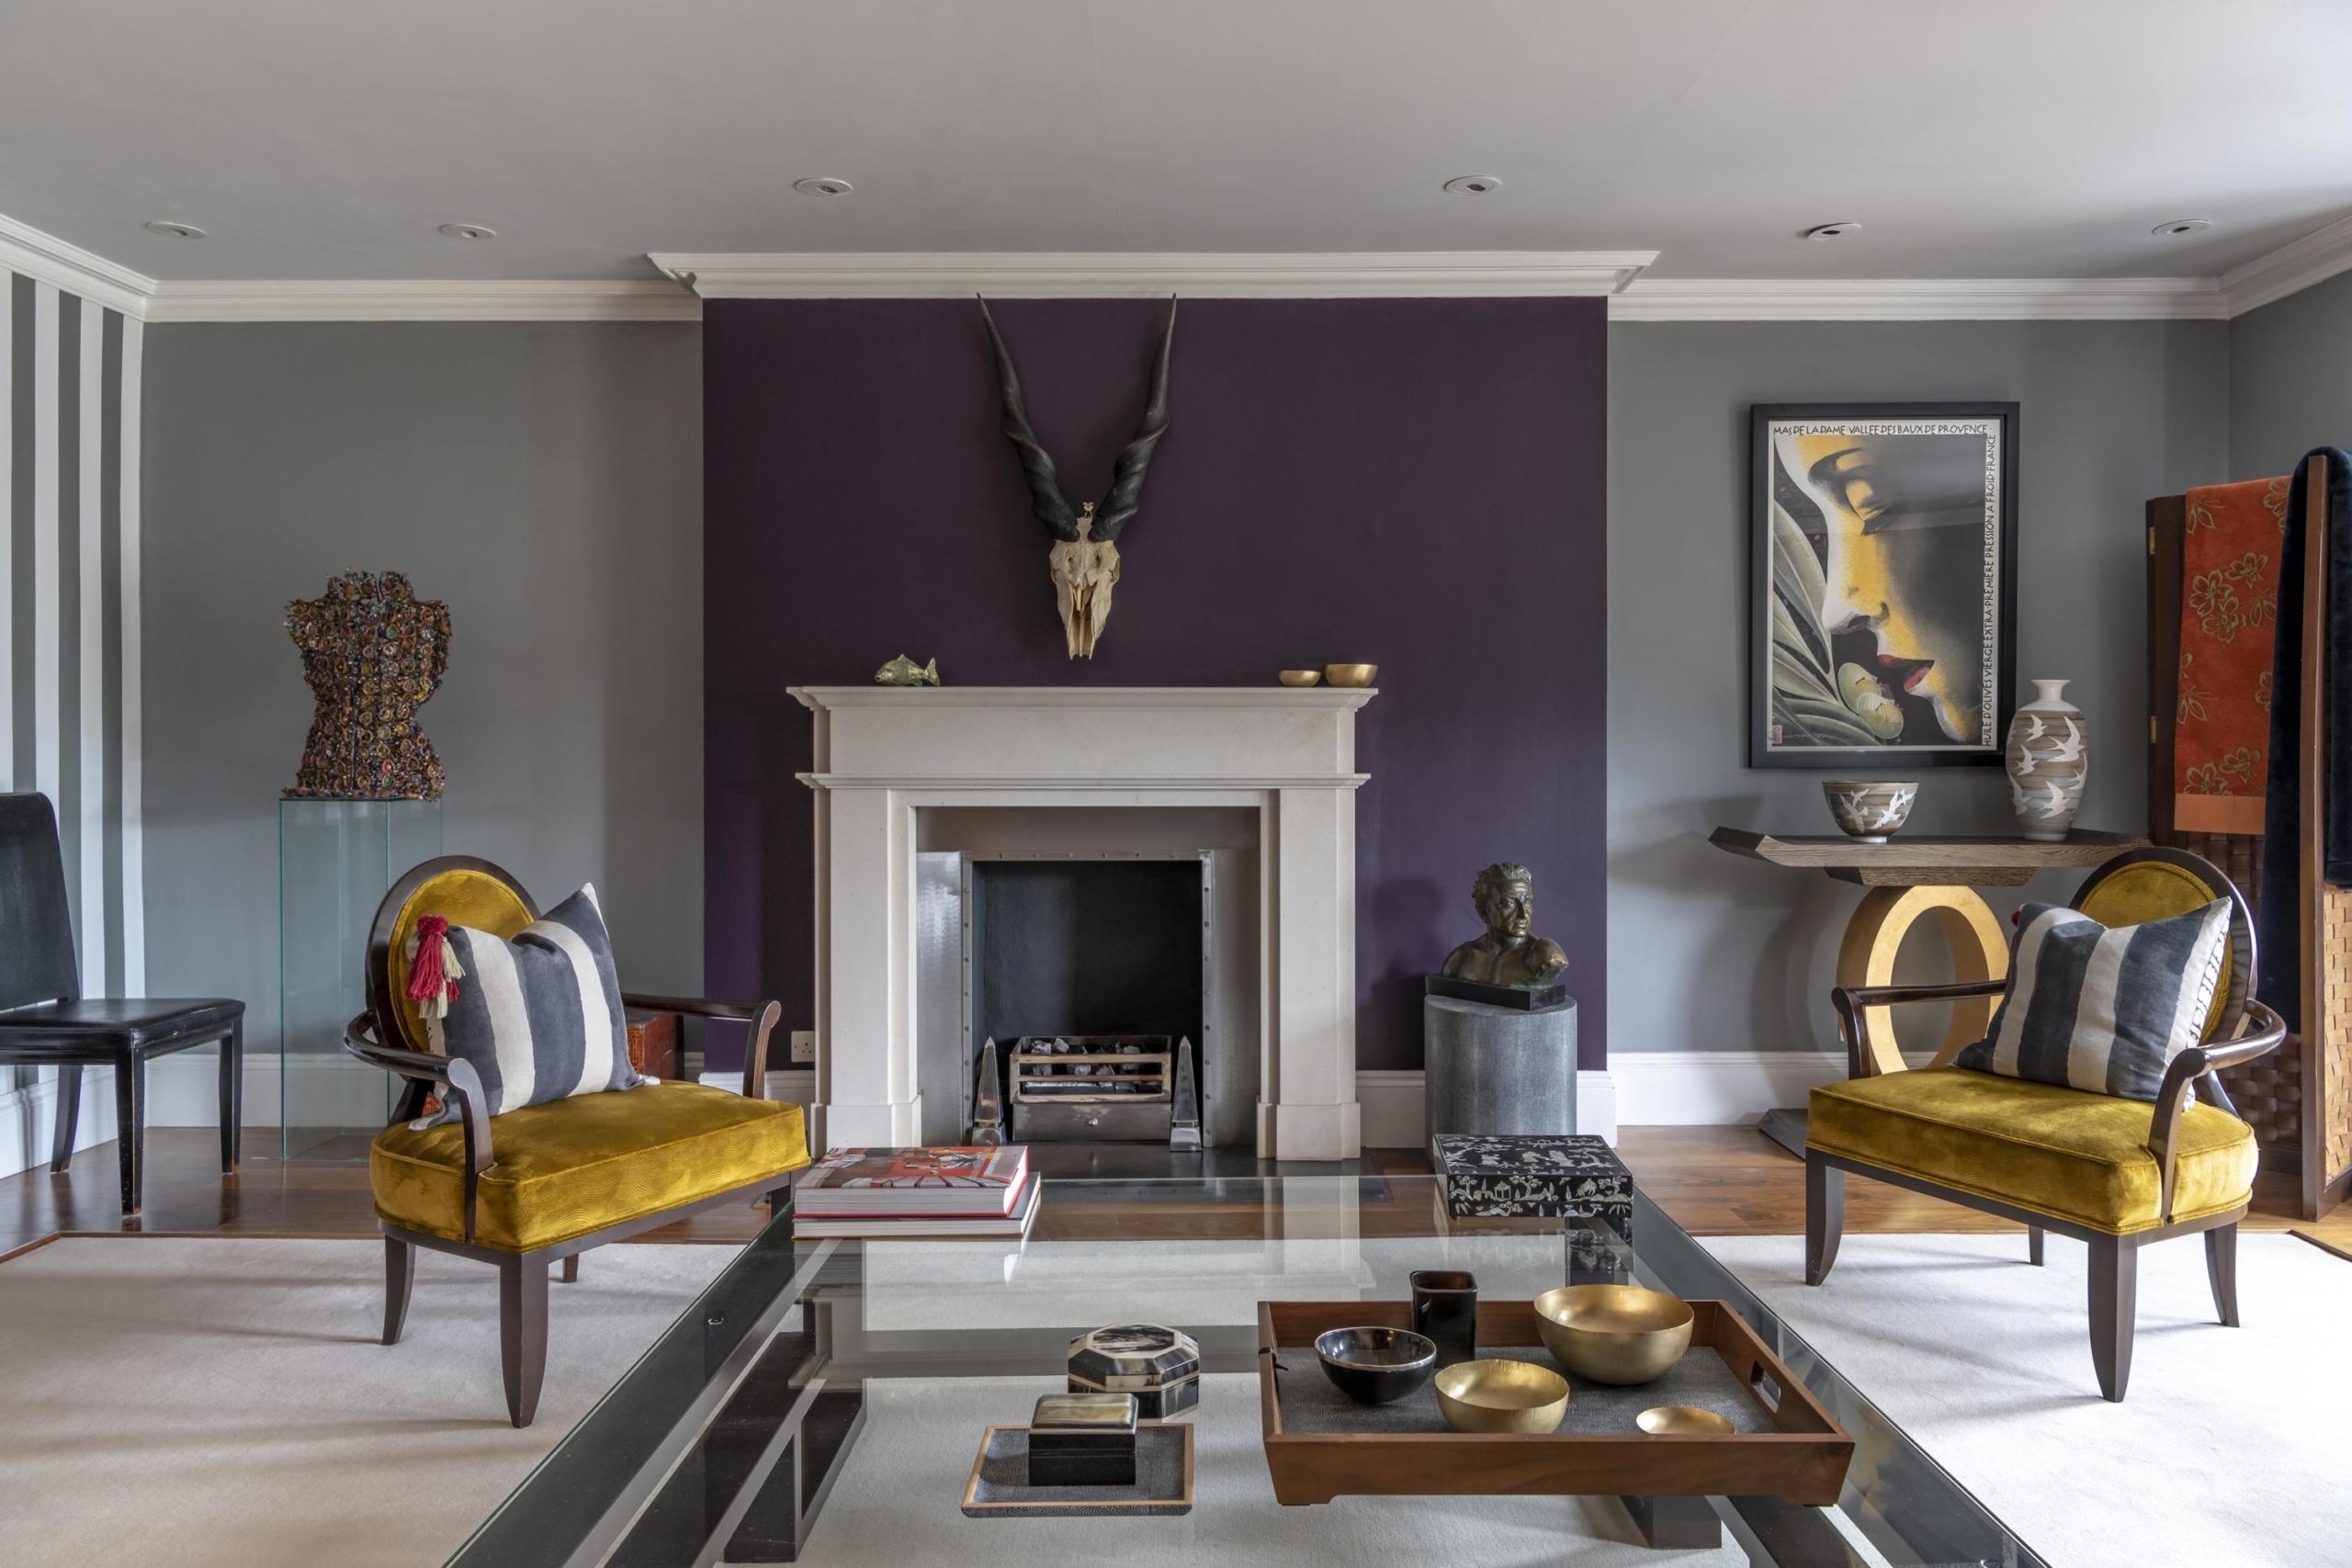 Diana Chick's Interior Design - after photo-manipulation